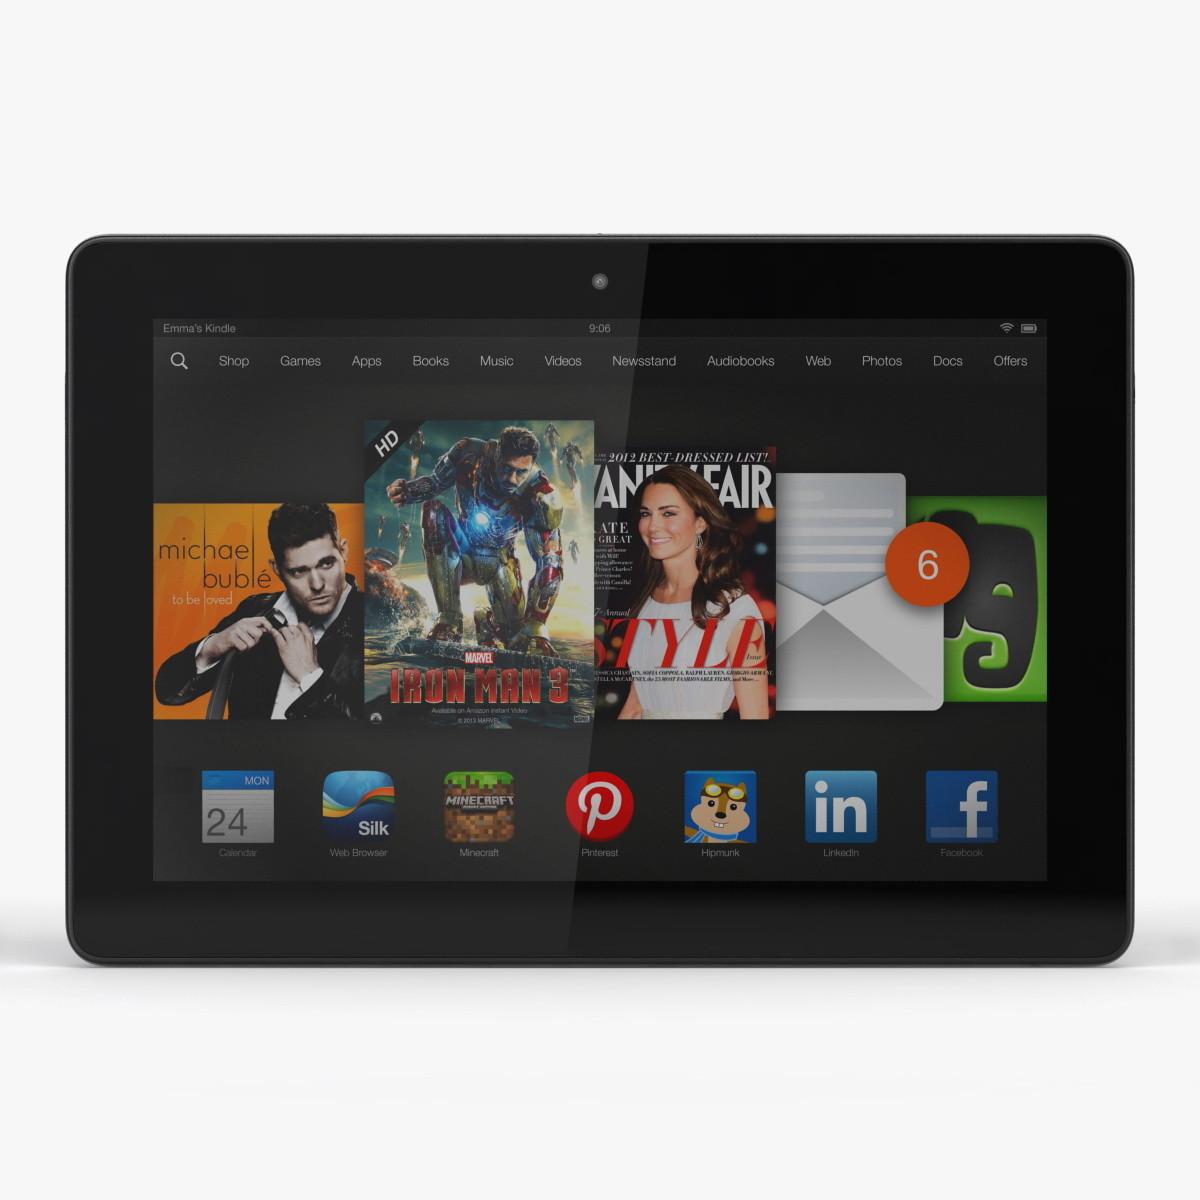 Amazon Kindle Fire HDX 8